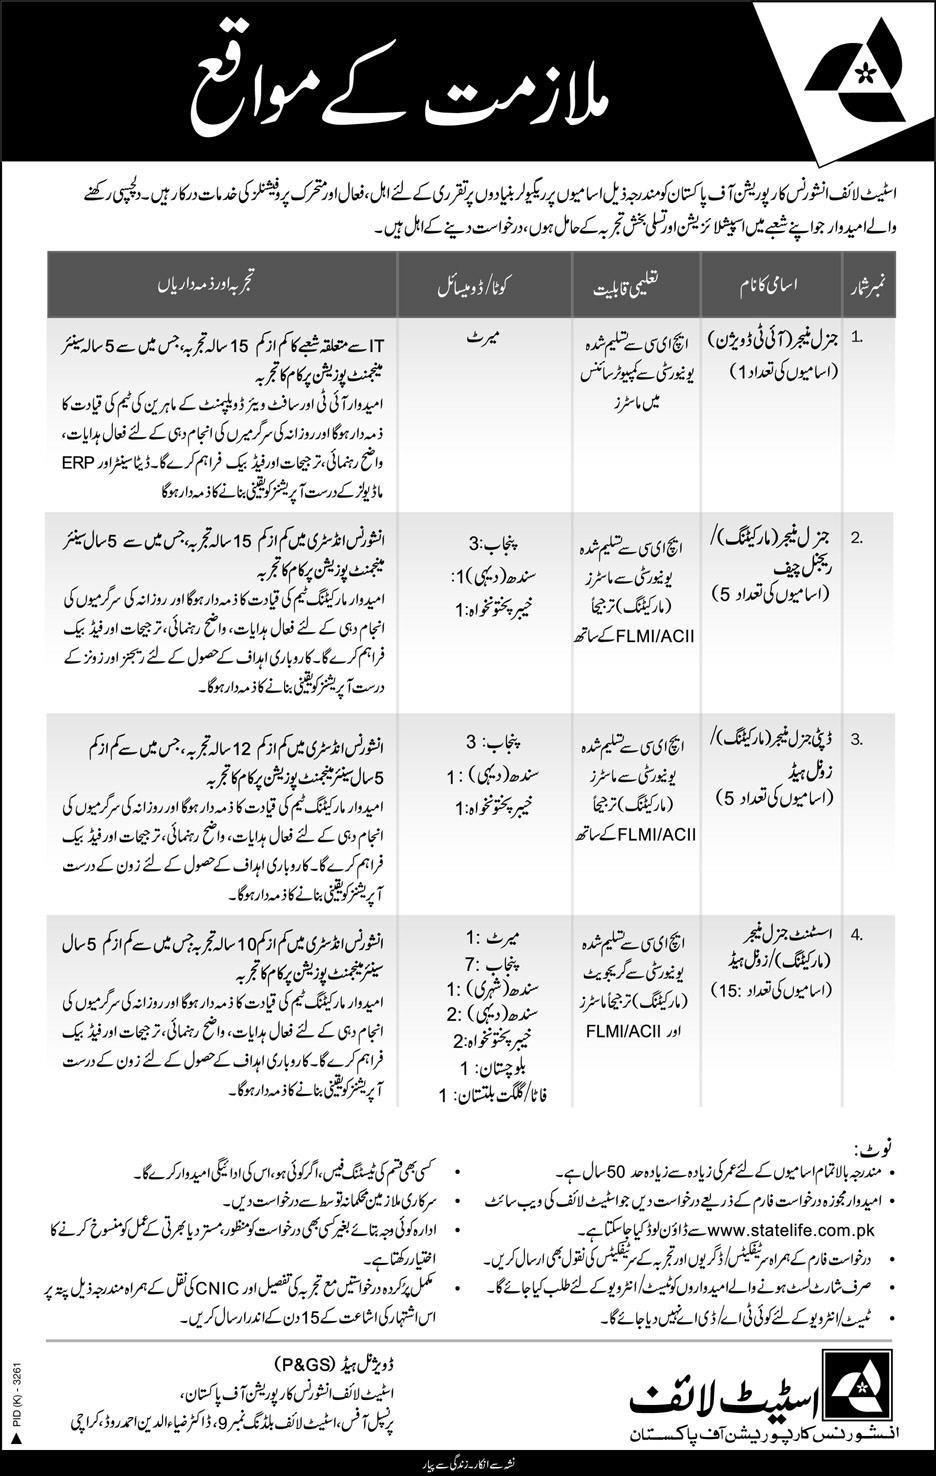 General Manager jobs Karachi 2019 Jobs in pakistan, Job